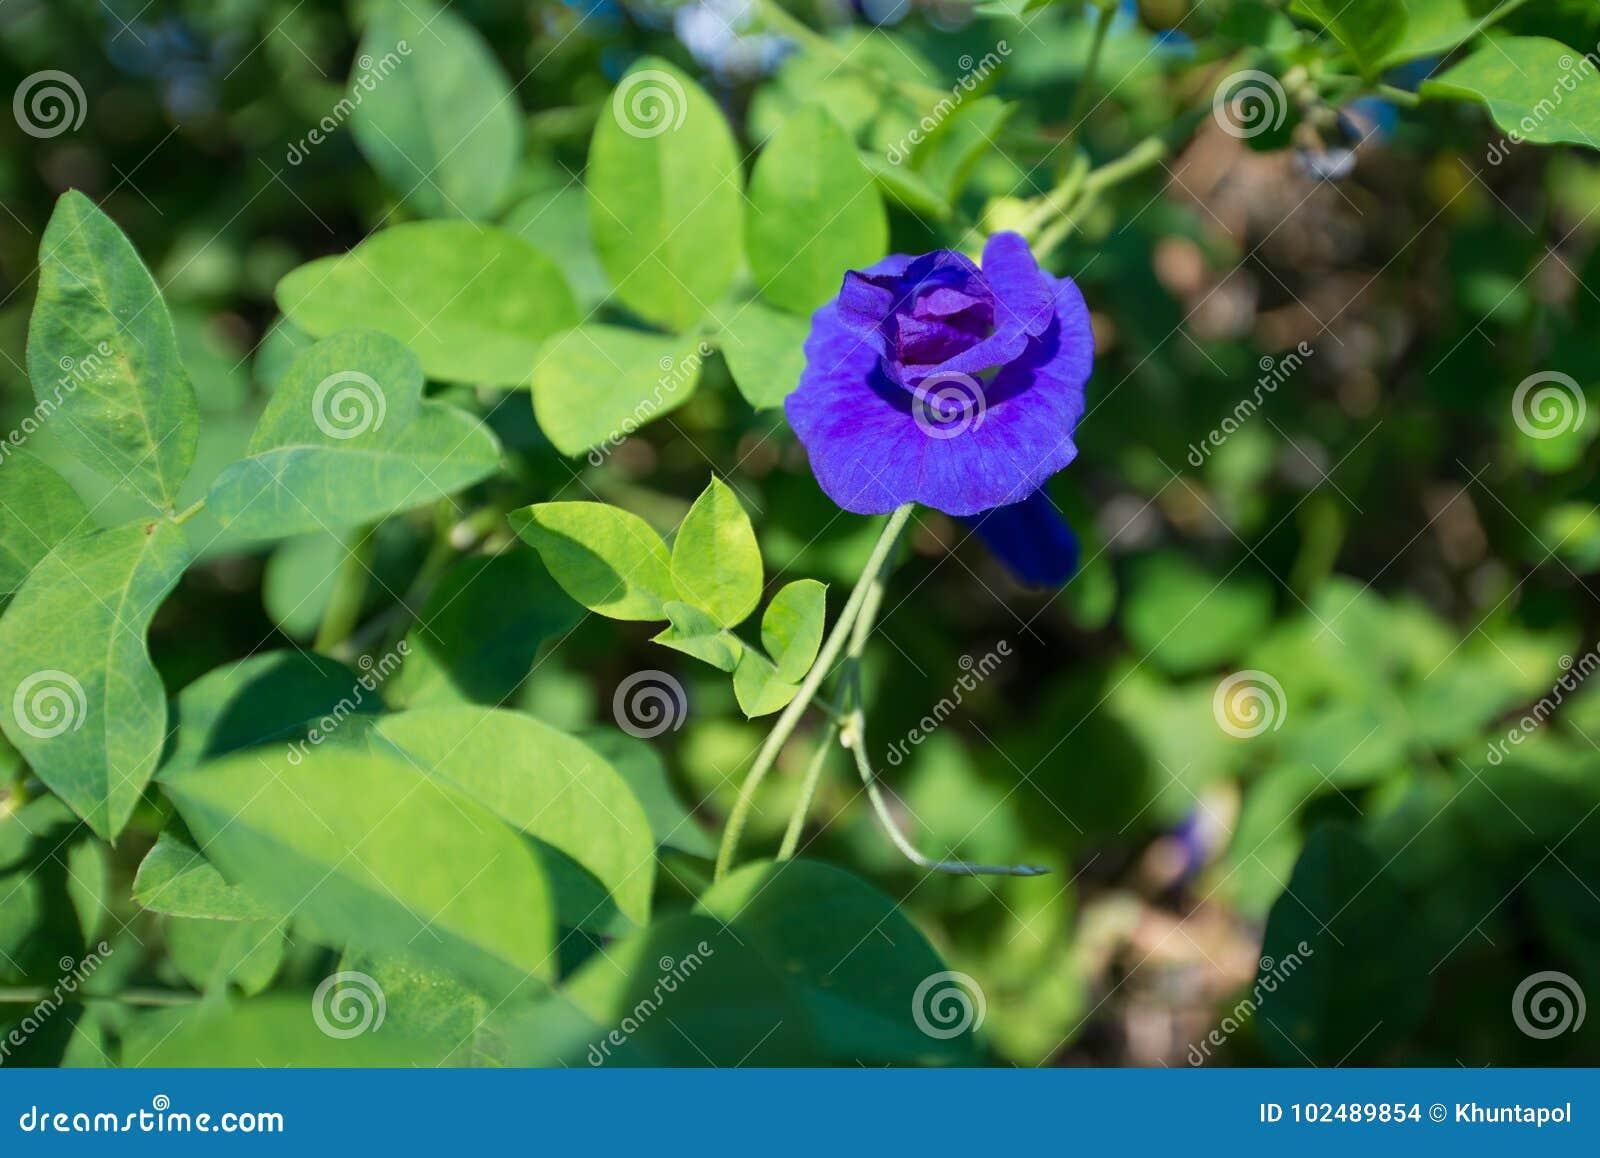 Butterfly pea or blue pea vine flower stock photo image of food download butterfly pea or blue pea vine flower stock photo image of food flower izmirmasajfo